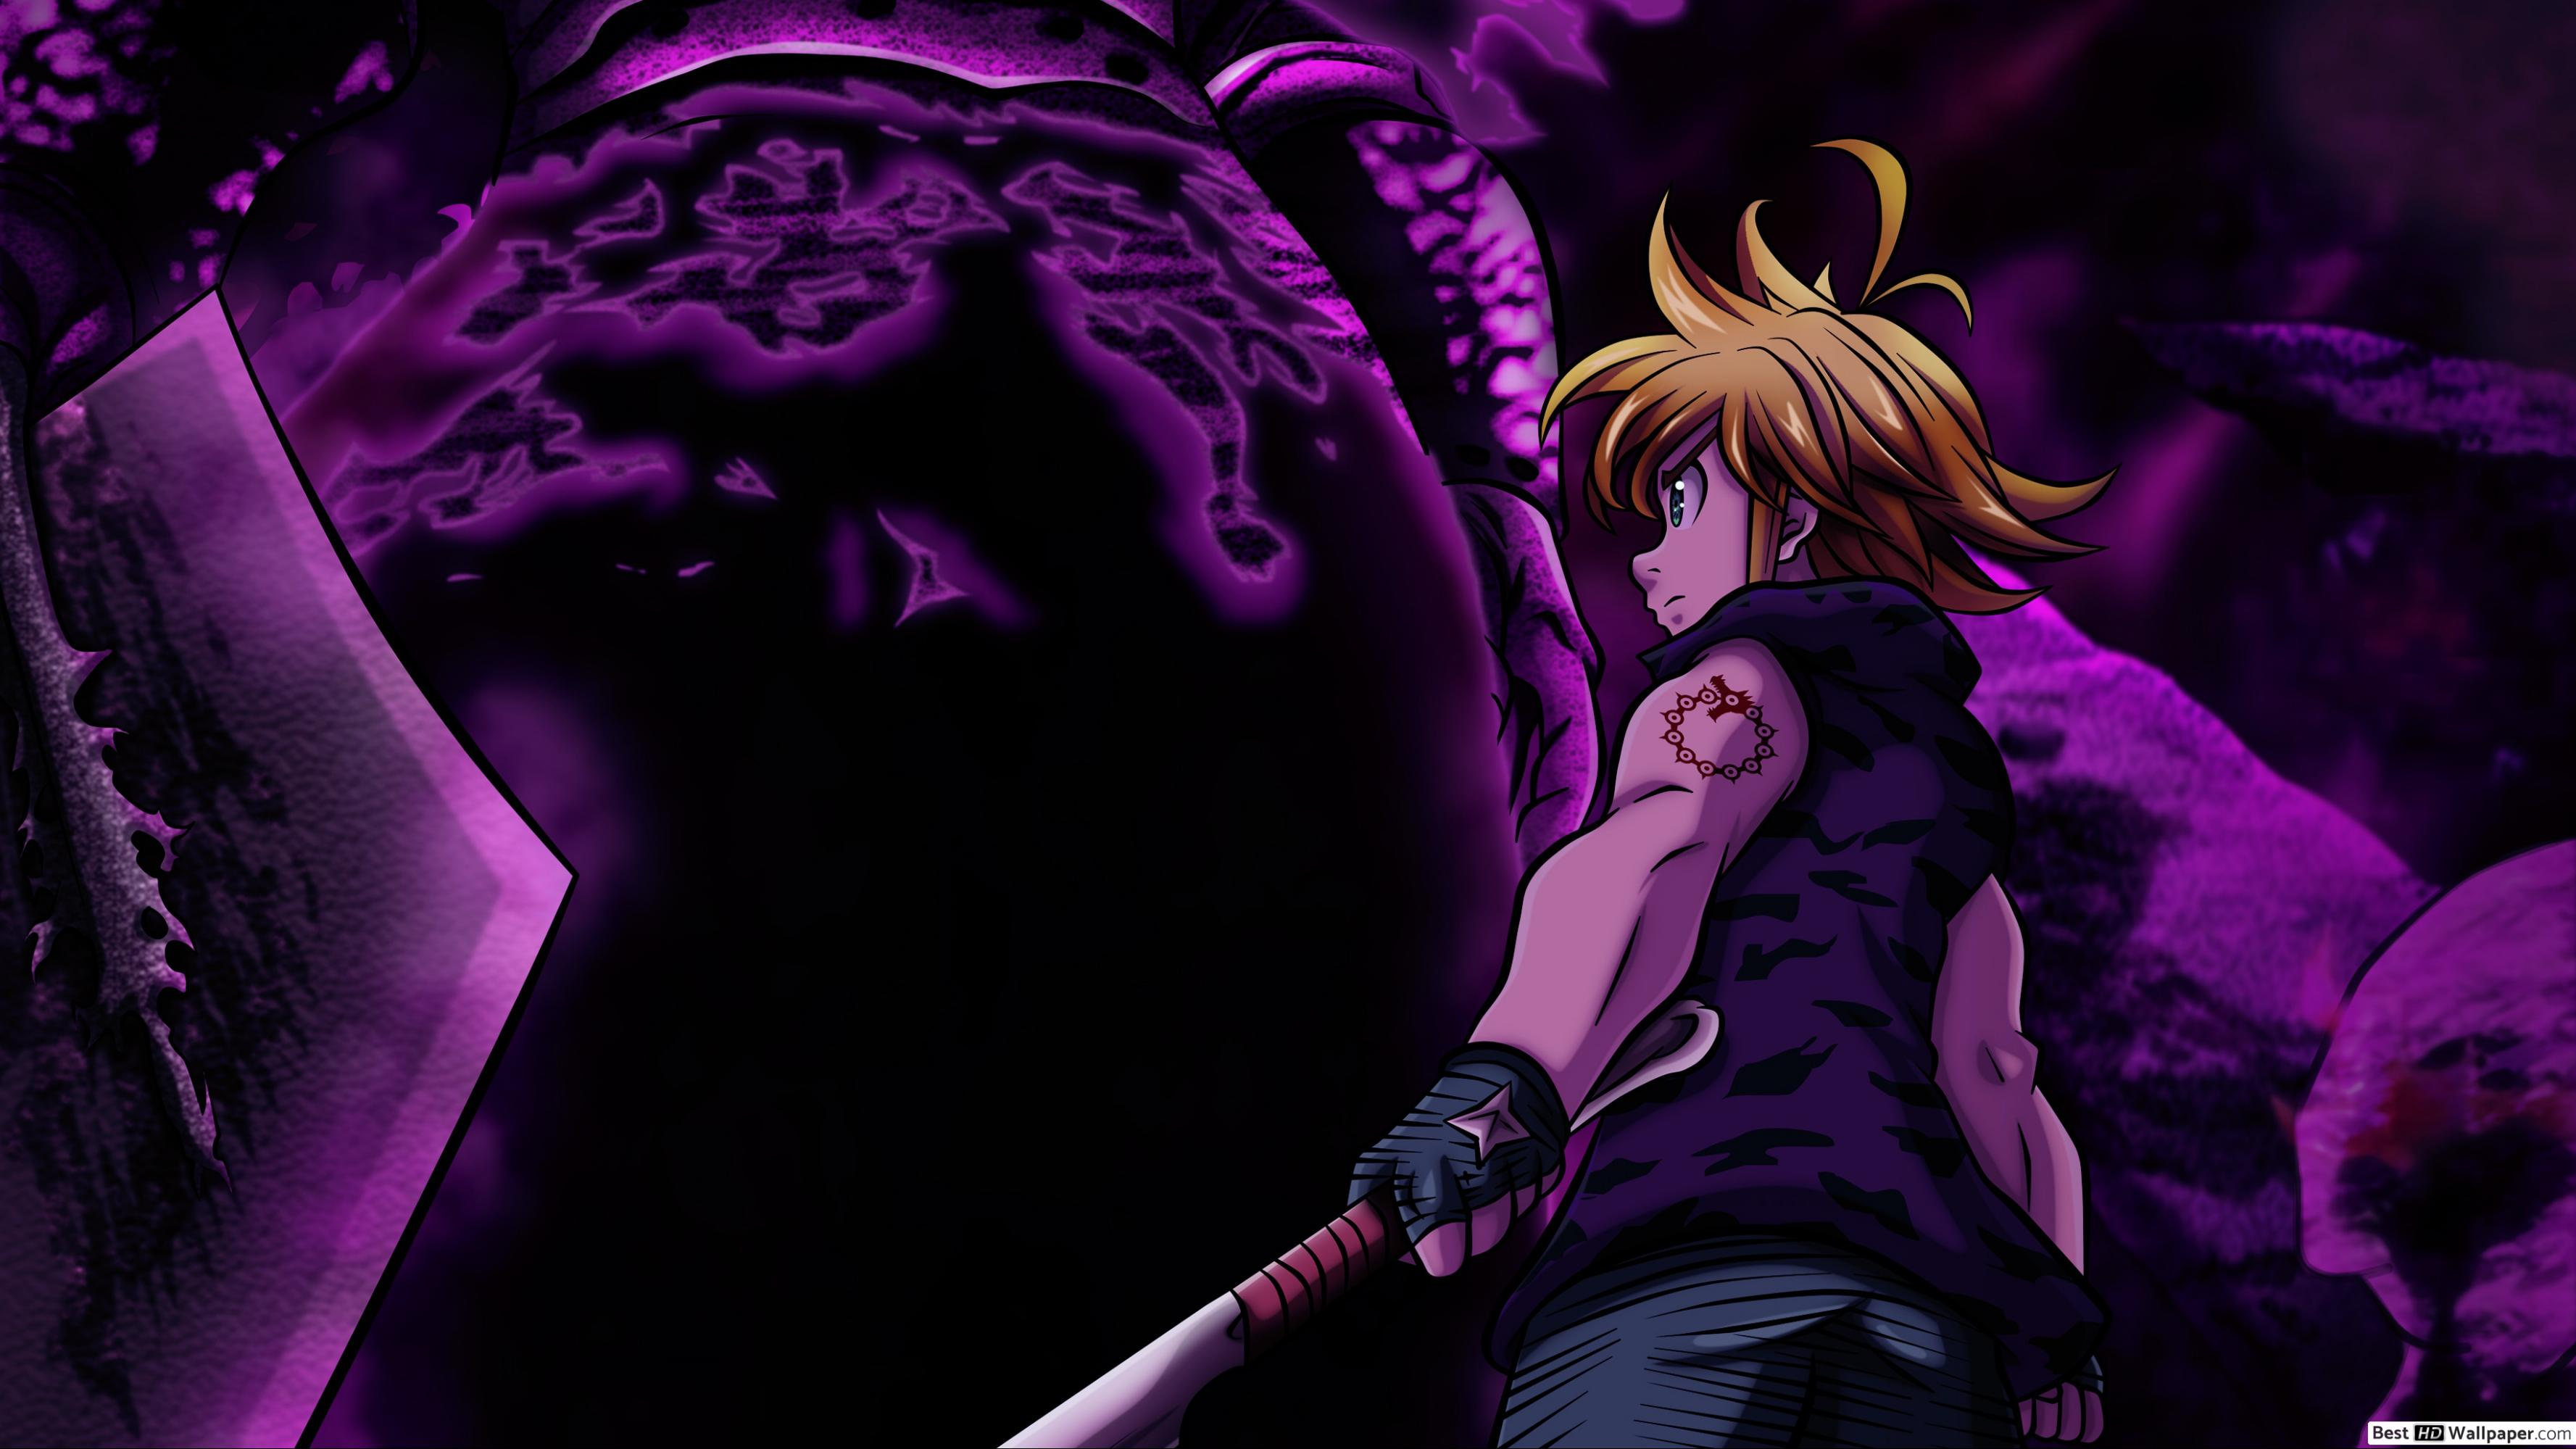 Meliodas Demon King Form 2543423 Hd Wallpaper Backgrounds Download